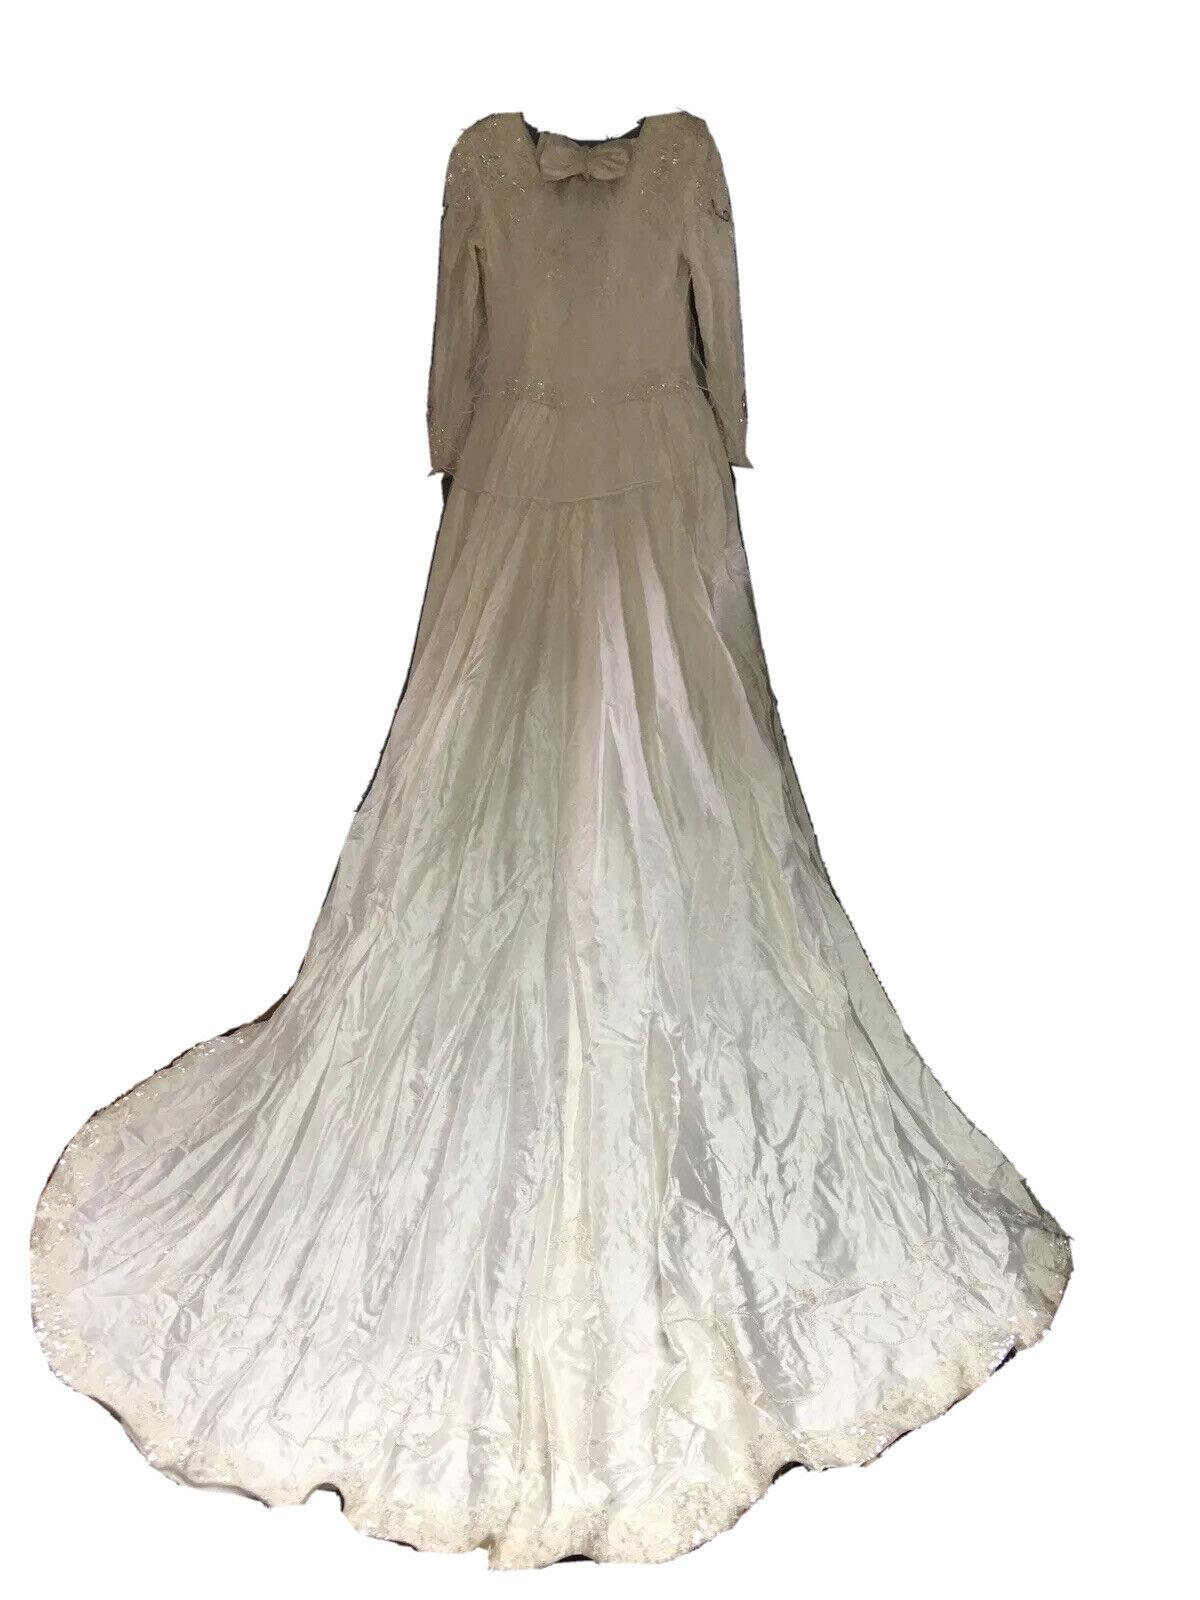 BEAUTIFUL Long Sleeve Mermaid Long Train VTG Wedding Dress Size L/XL EXPENSIVE!!